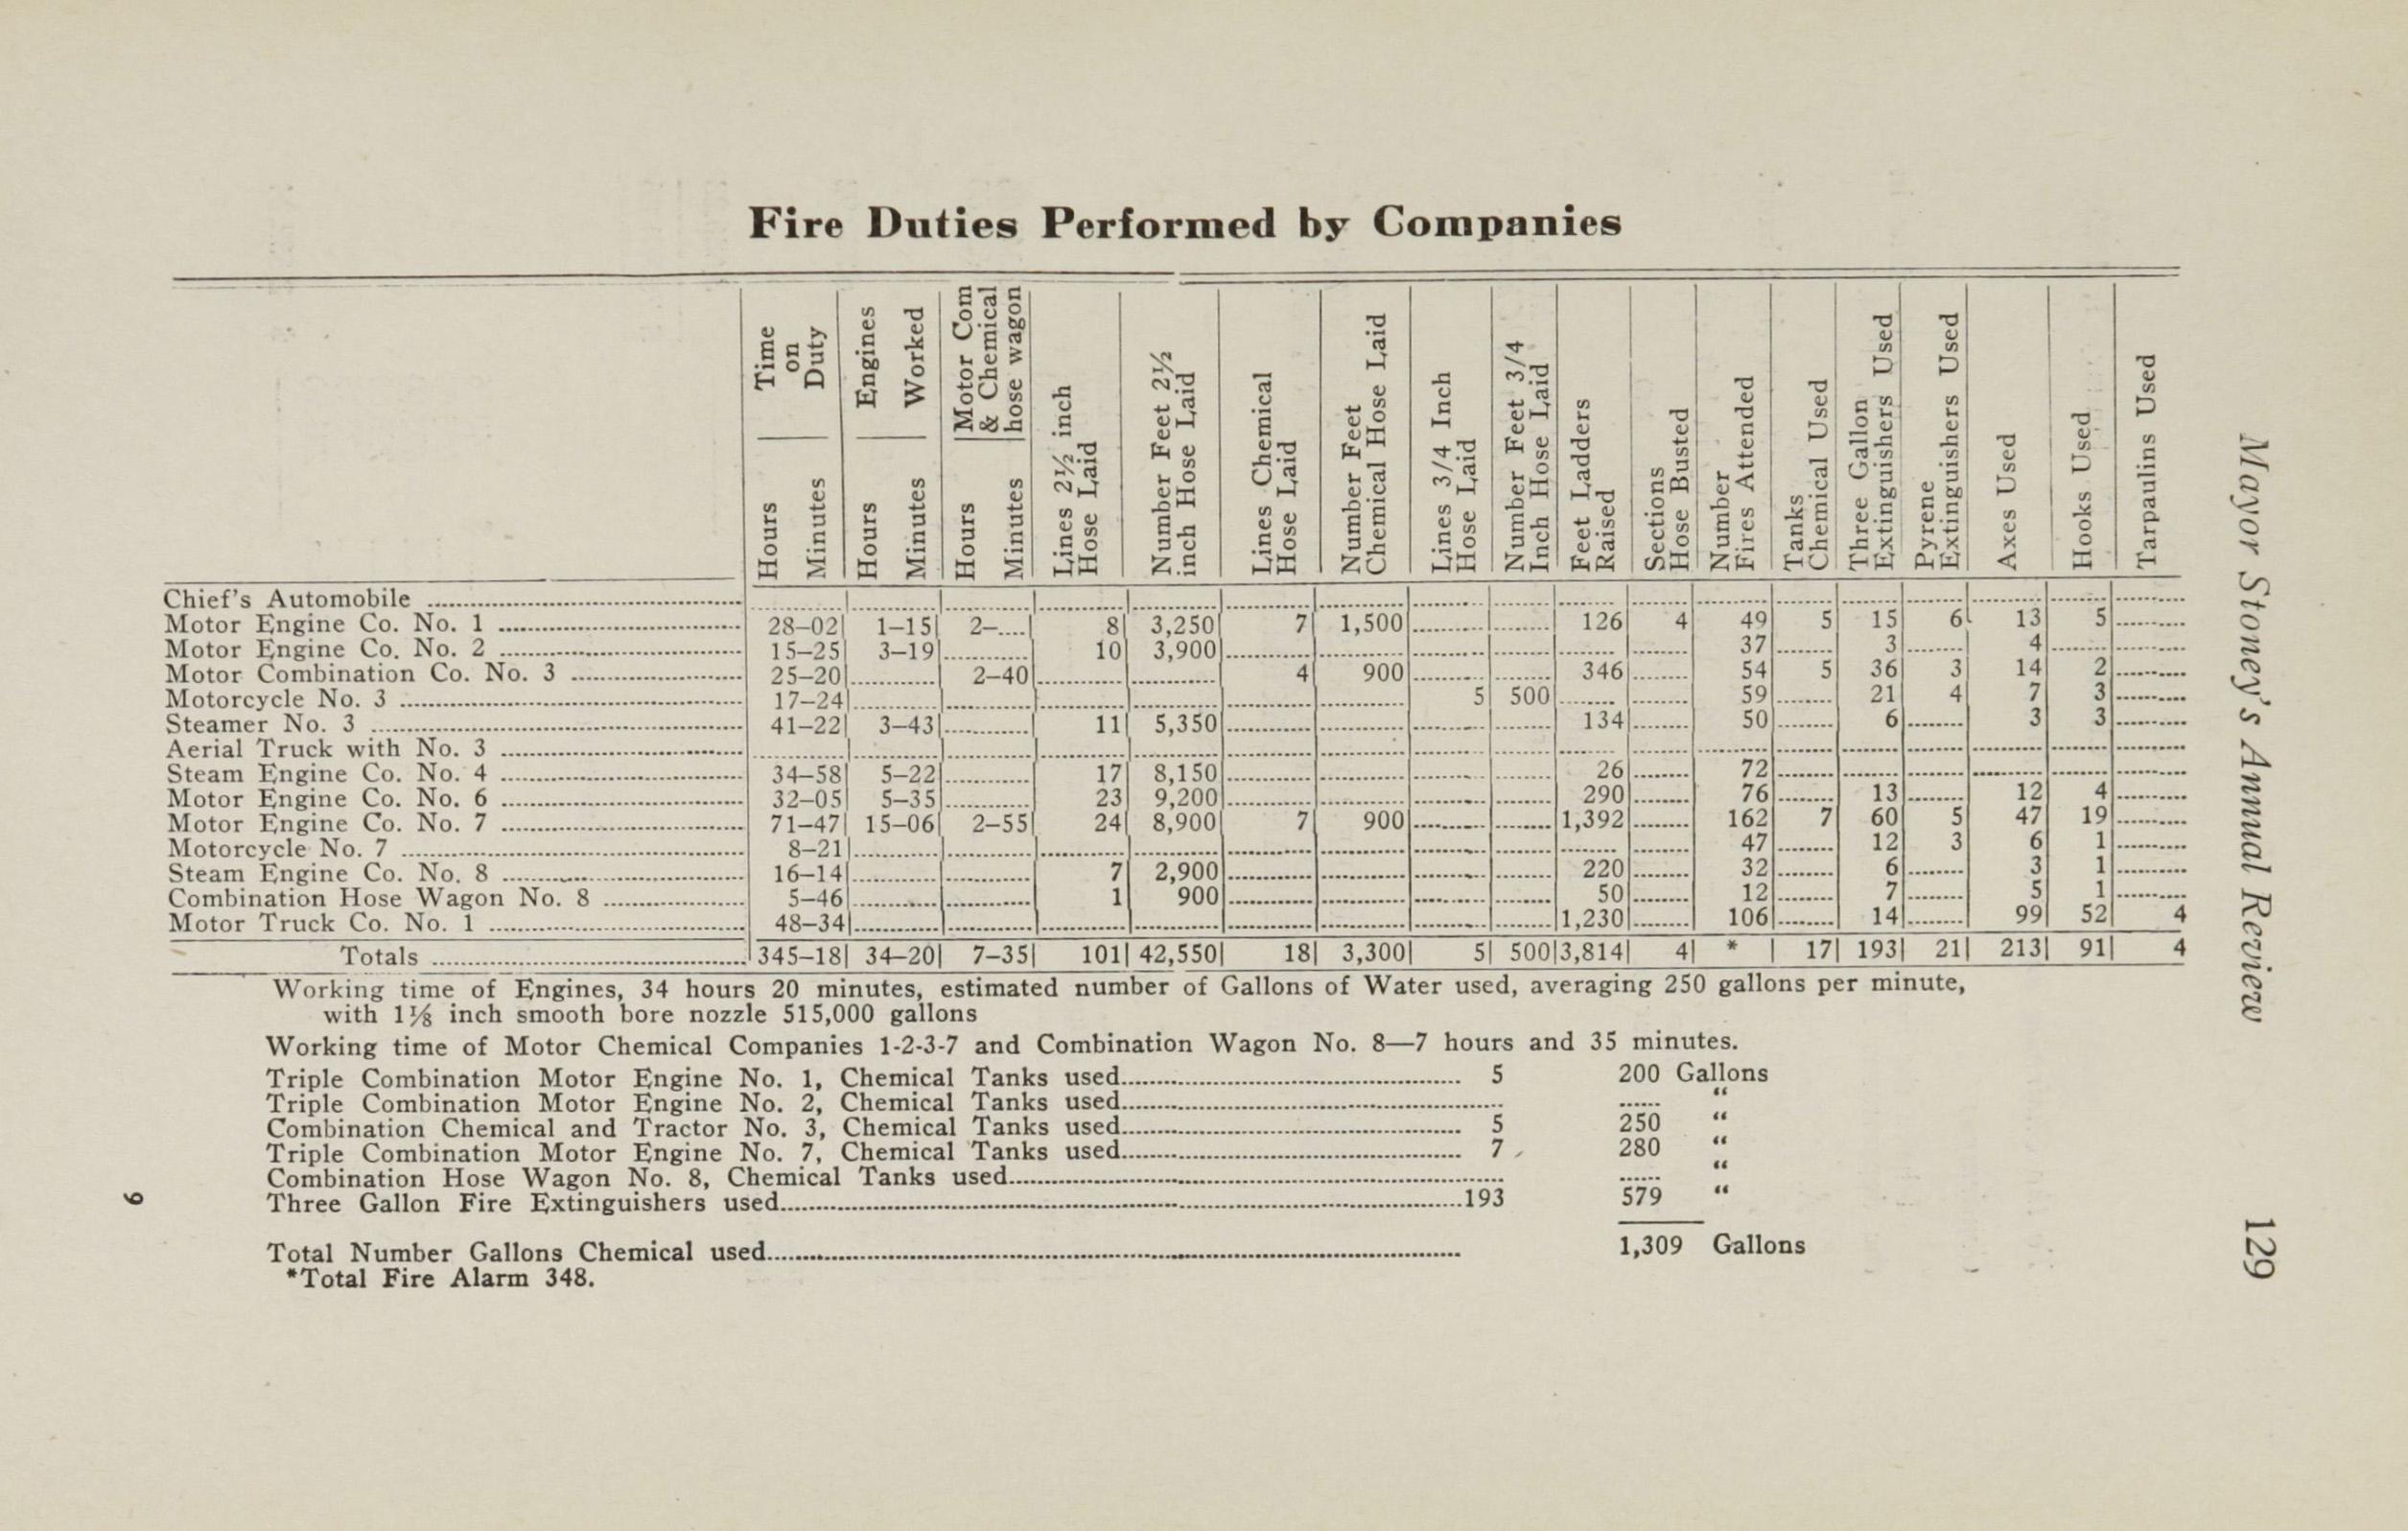 Charleston Yearbook, 1924, page 129